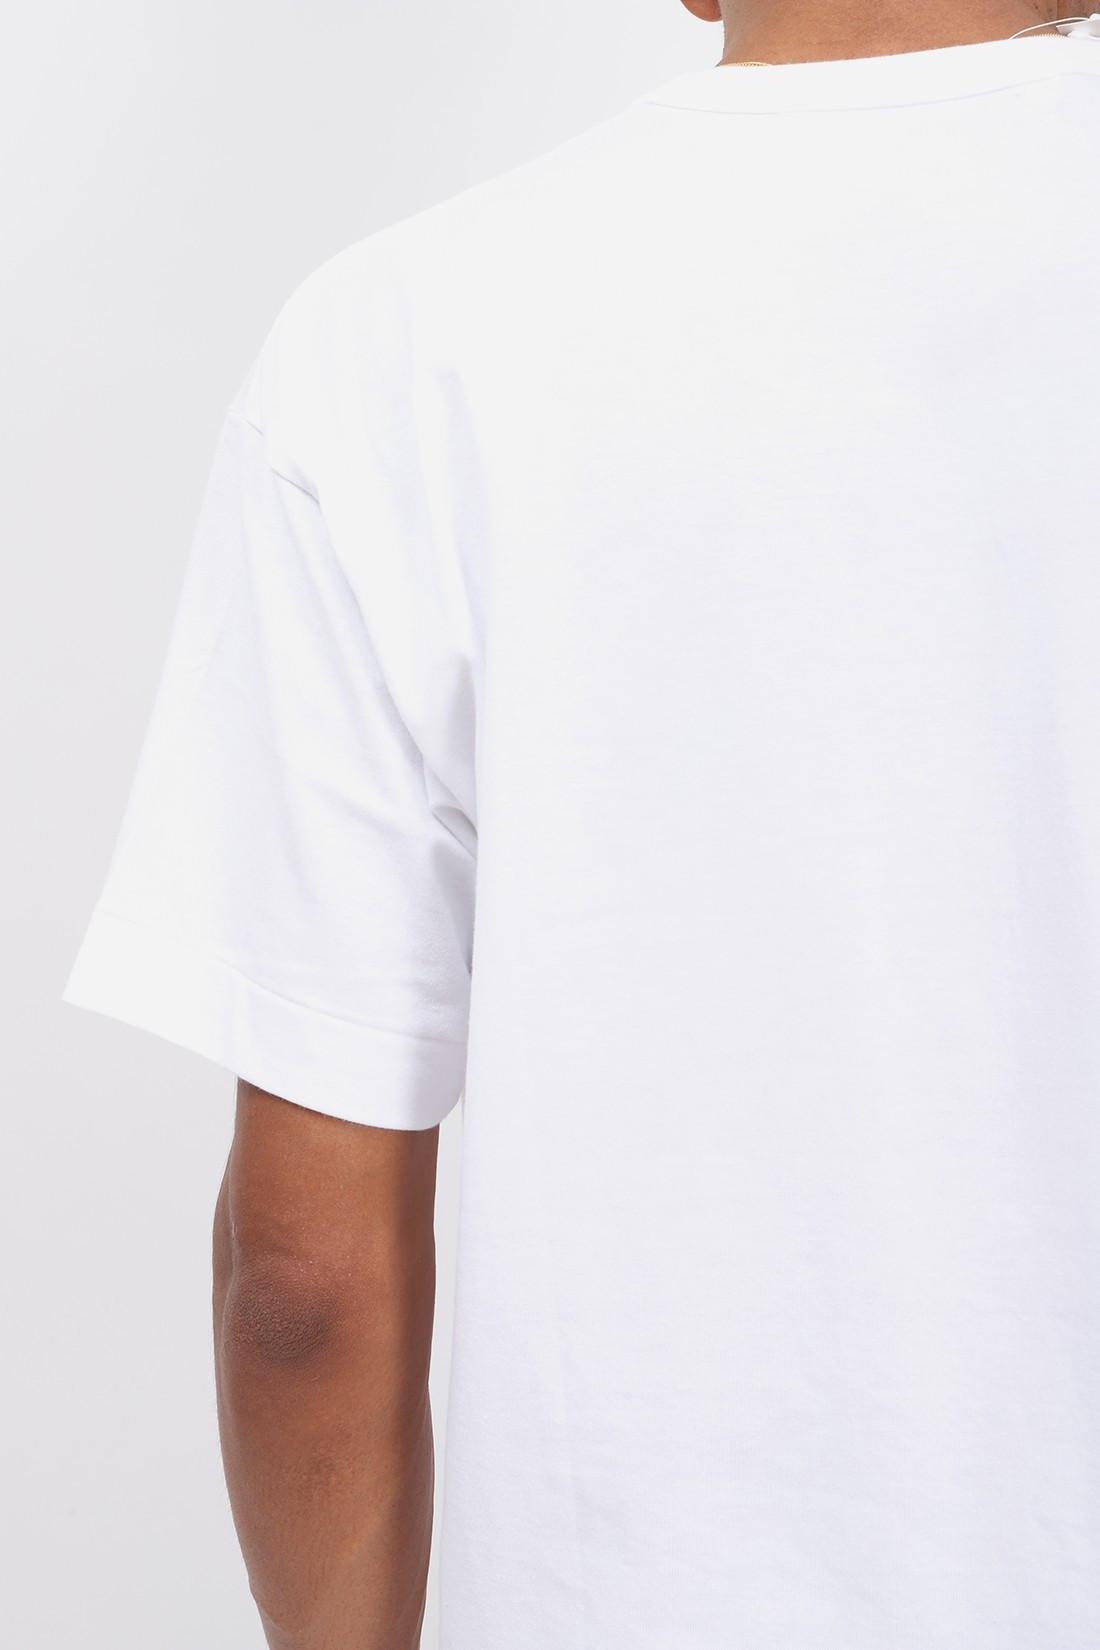 COMME DES GARÇONS PLAY / Red play t-shirt blue eyes White